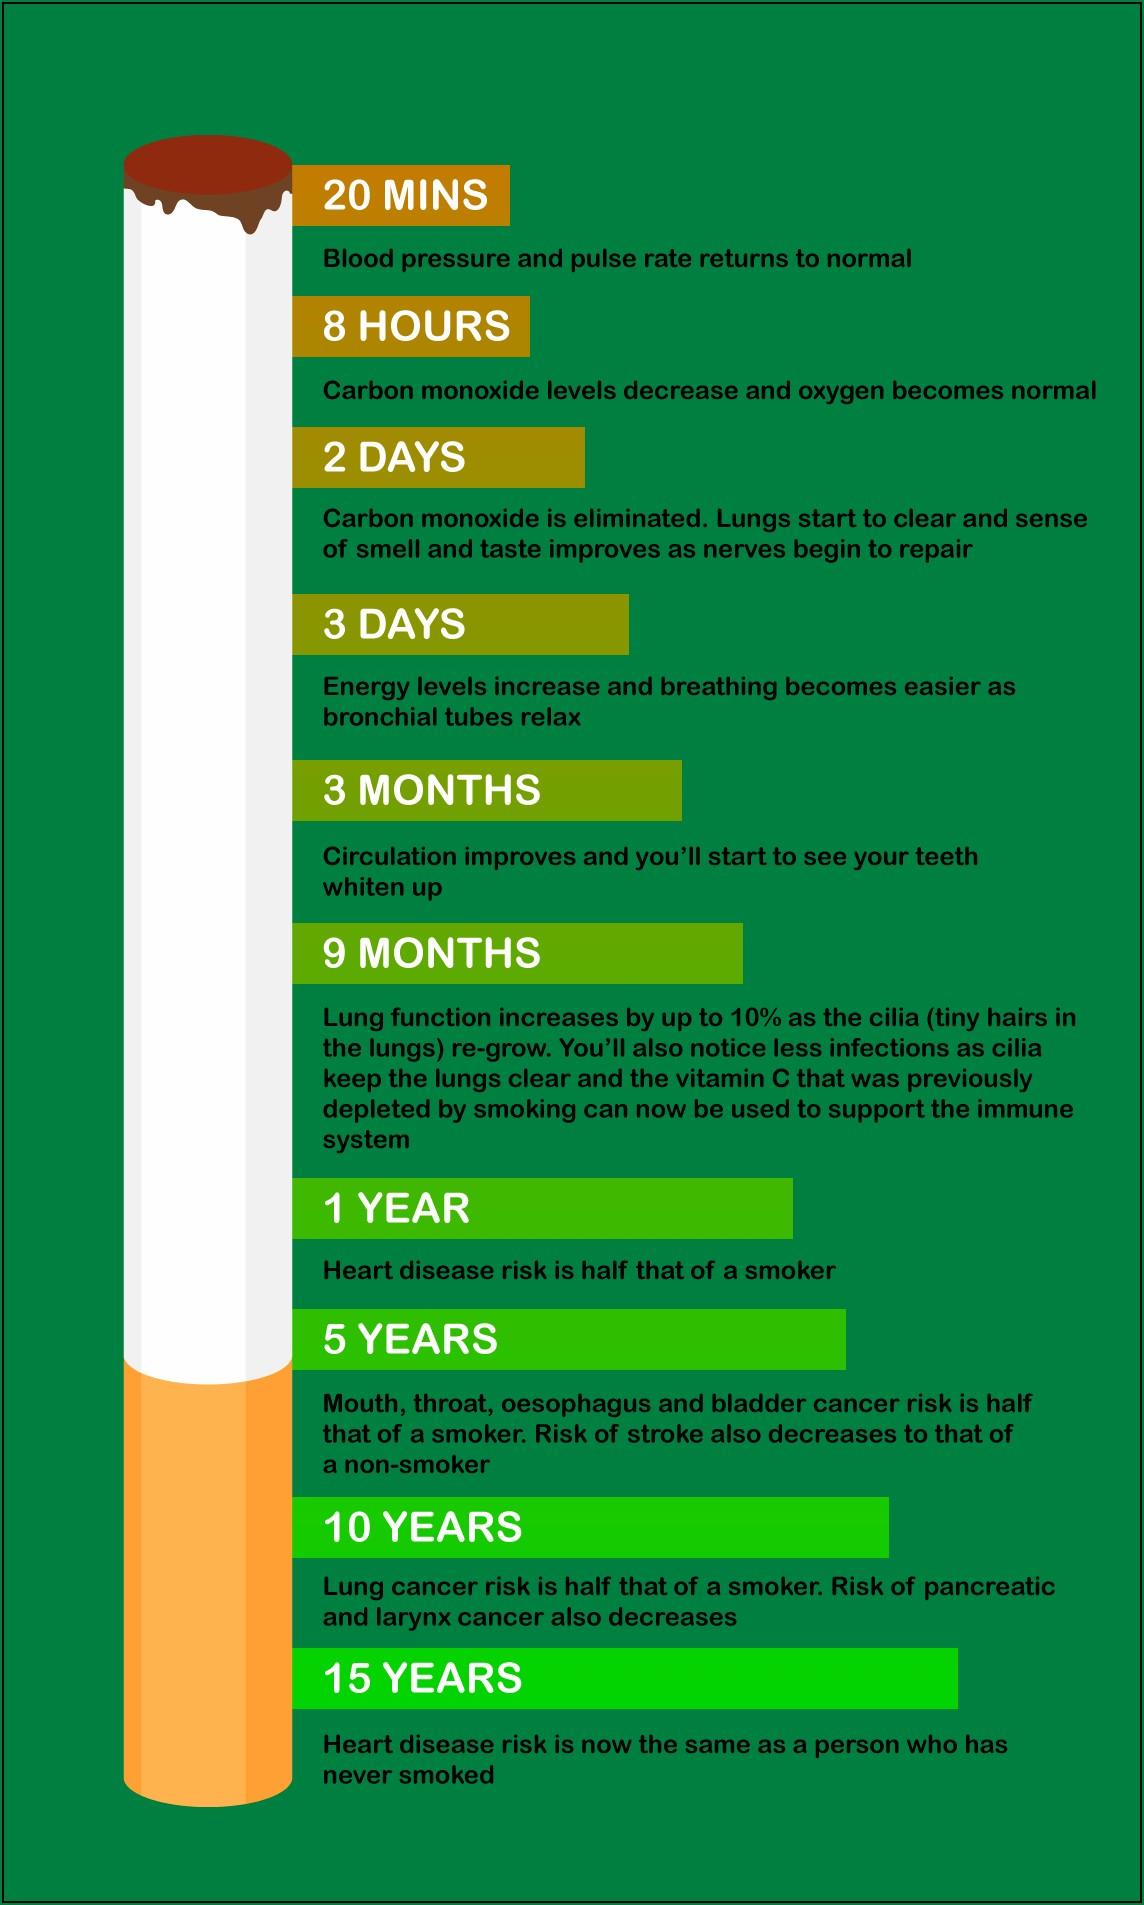 Quit Smoking Benefits Timeline Skin